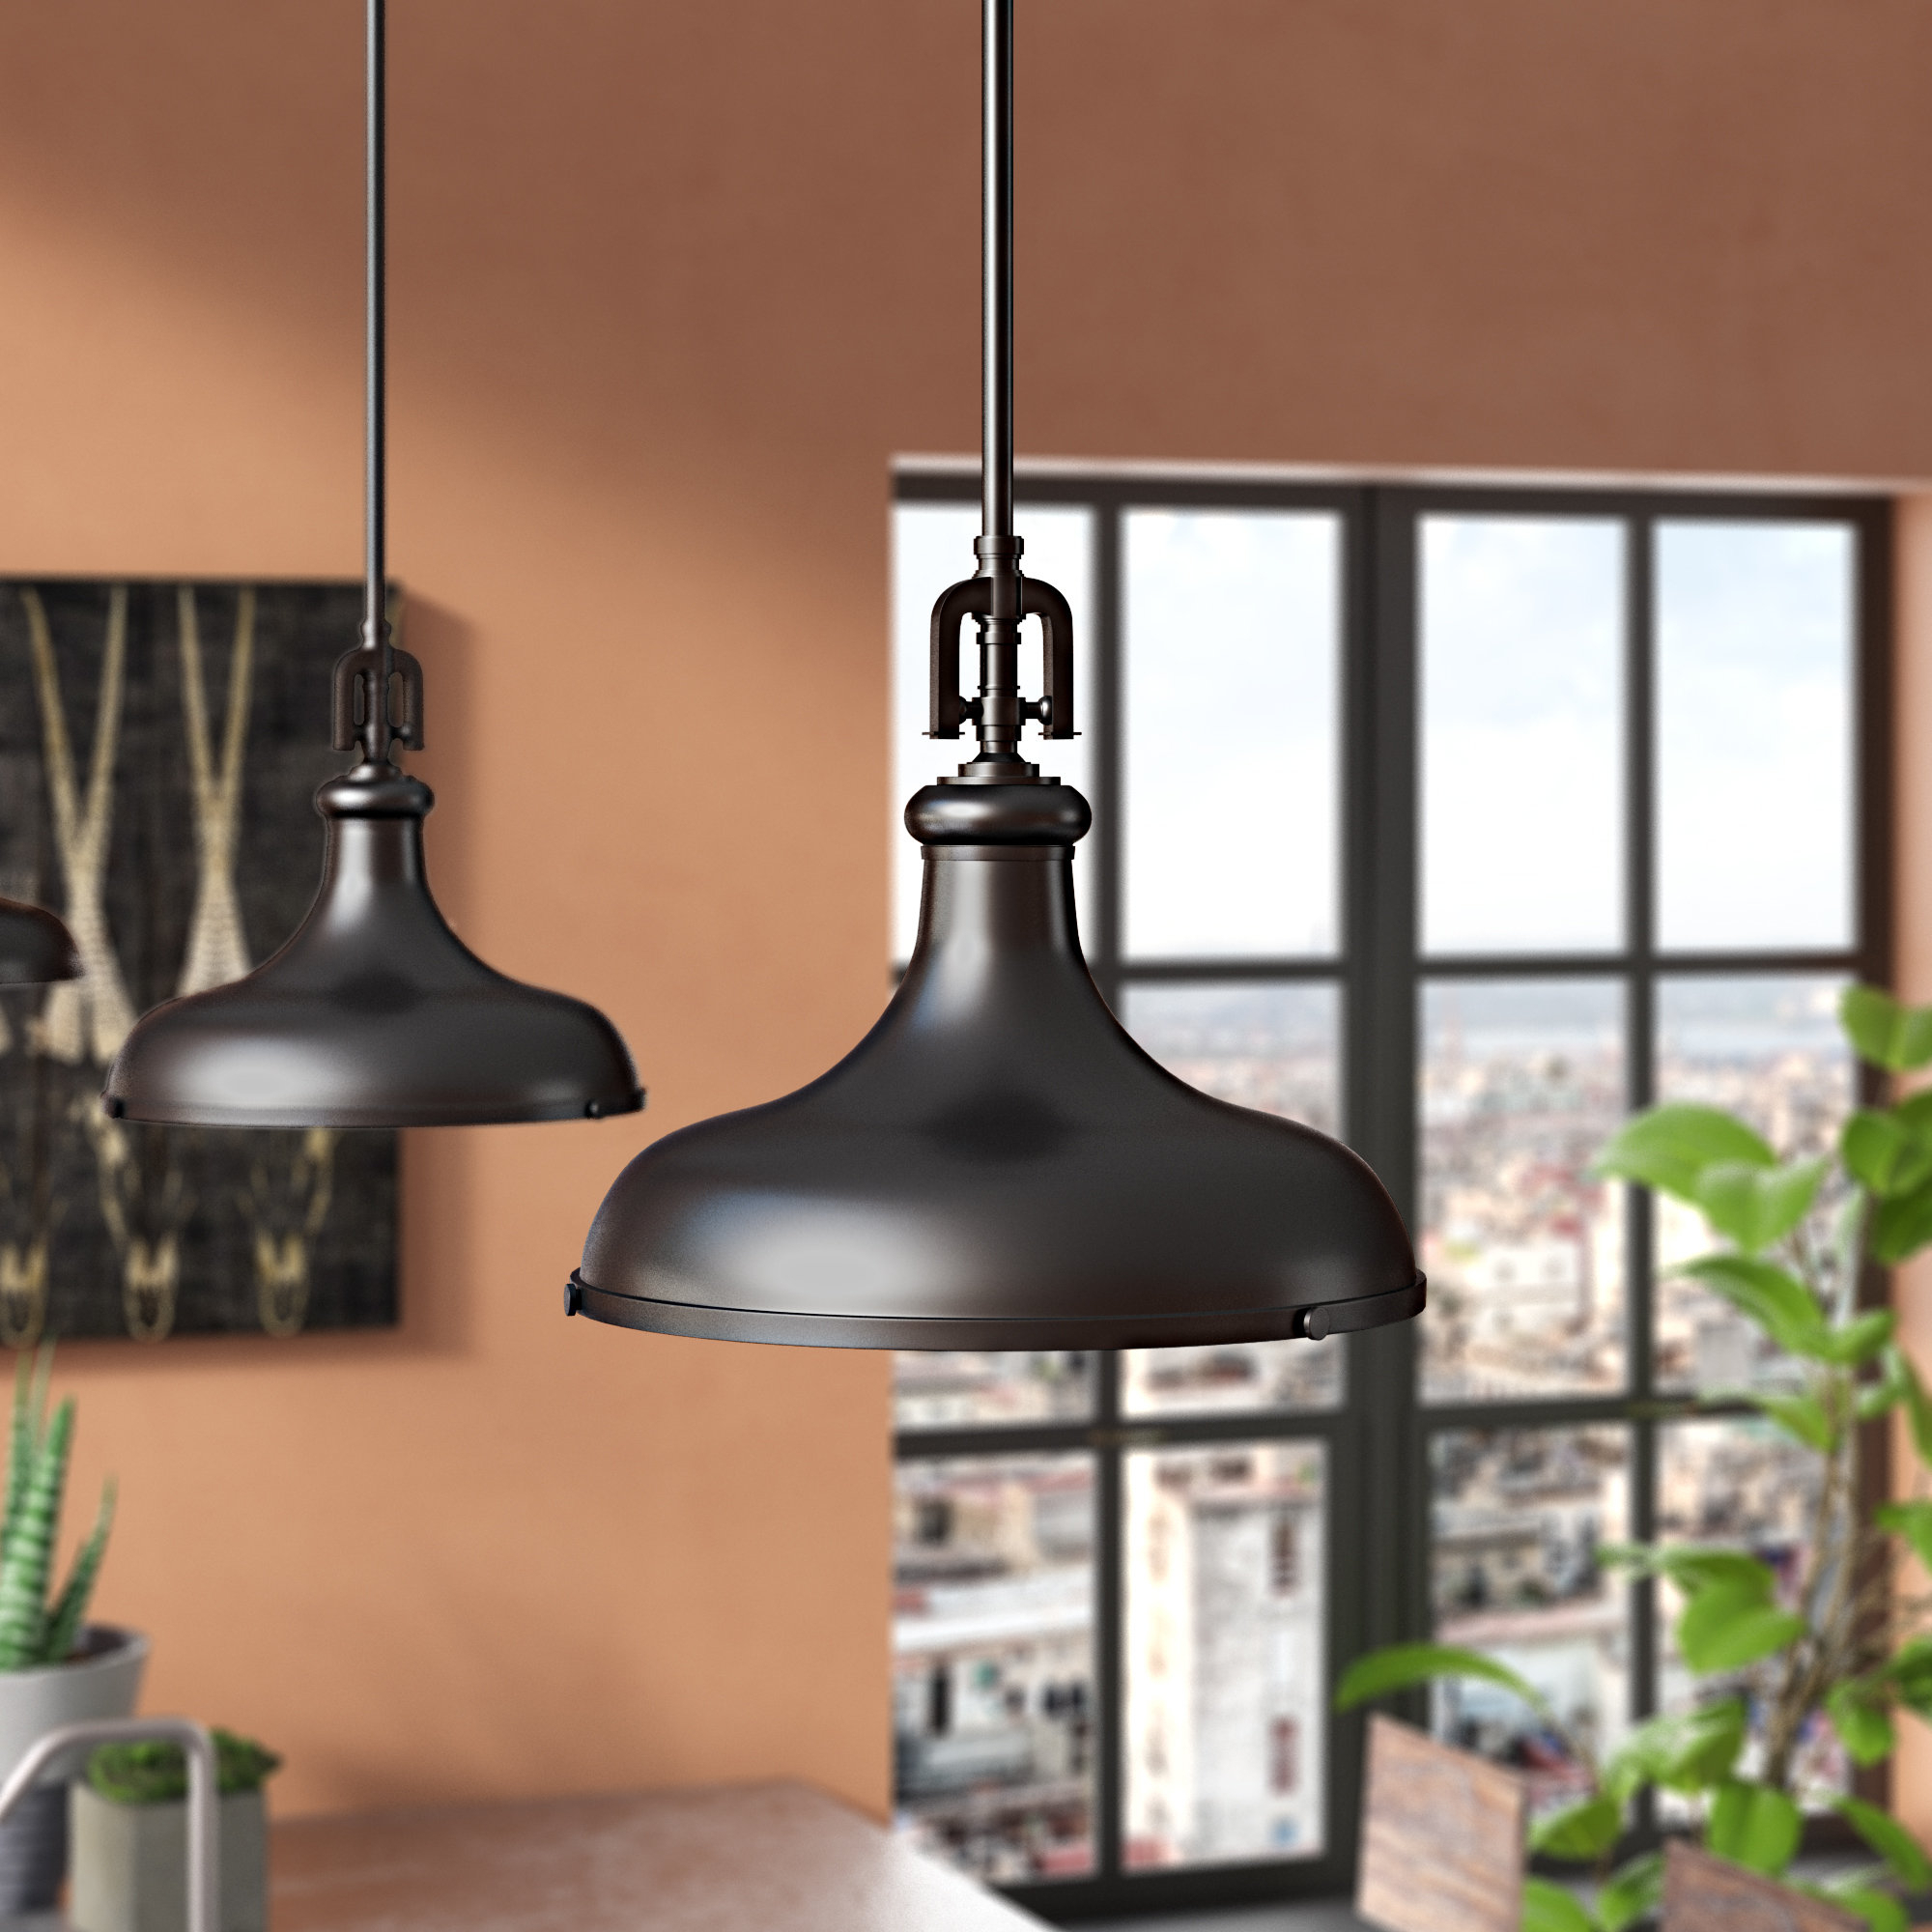 Dome Mini Pendants You'll Love | Wayfair.ca for Abernathy 1-Light Dome Pendants (Image 15 of 30)